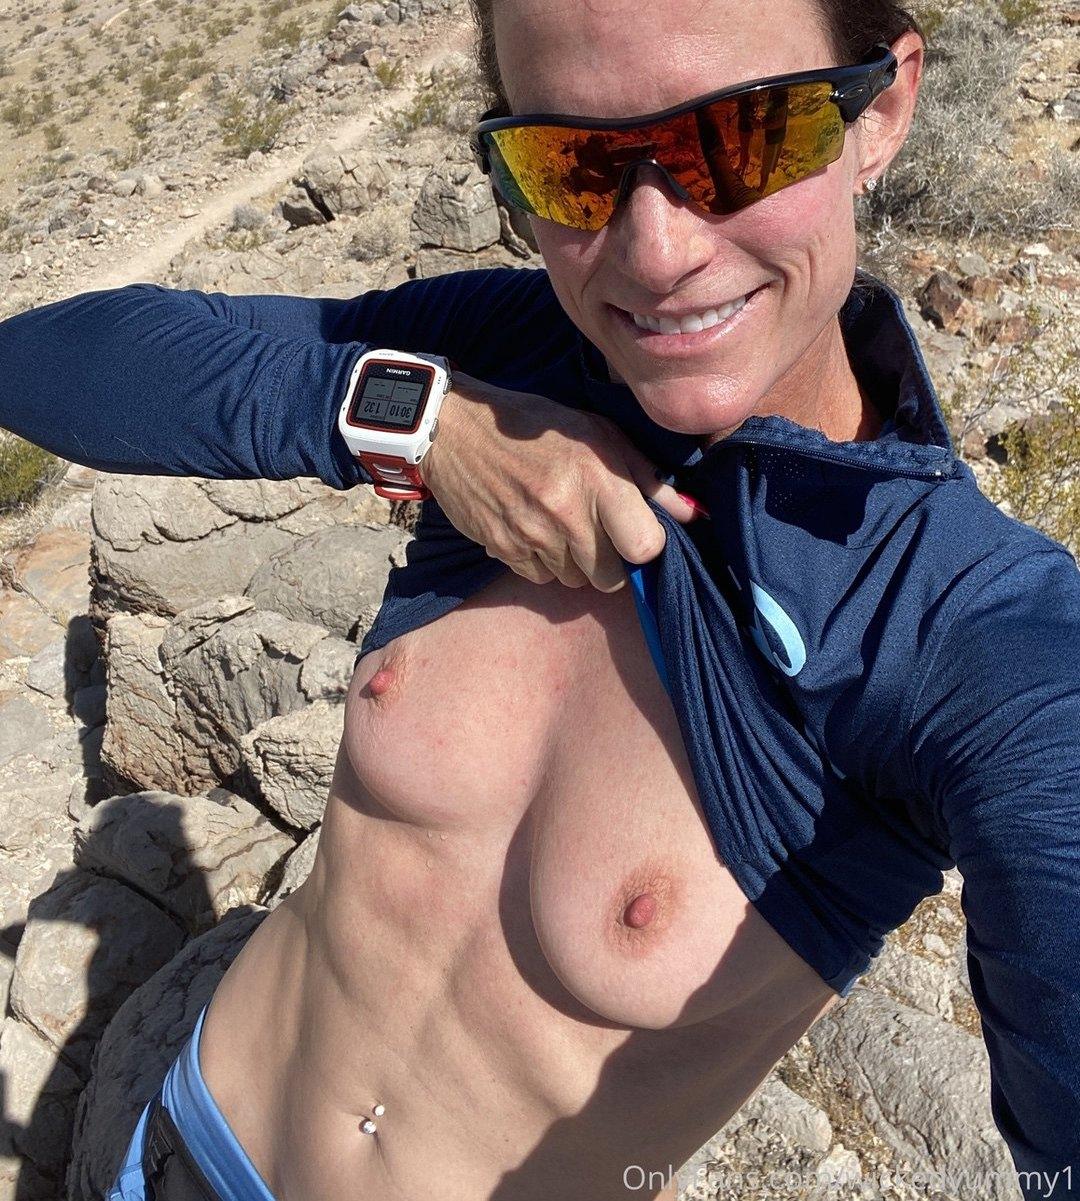 Sofie Marie Wickedyummy1 Onlyfans Nudes Leaks 0007